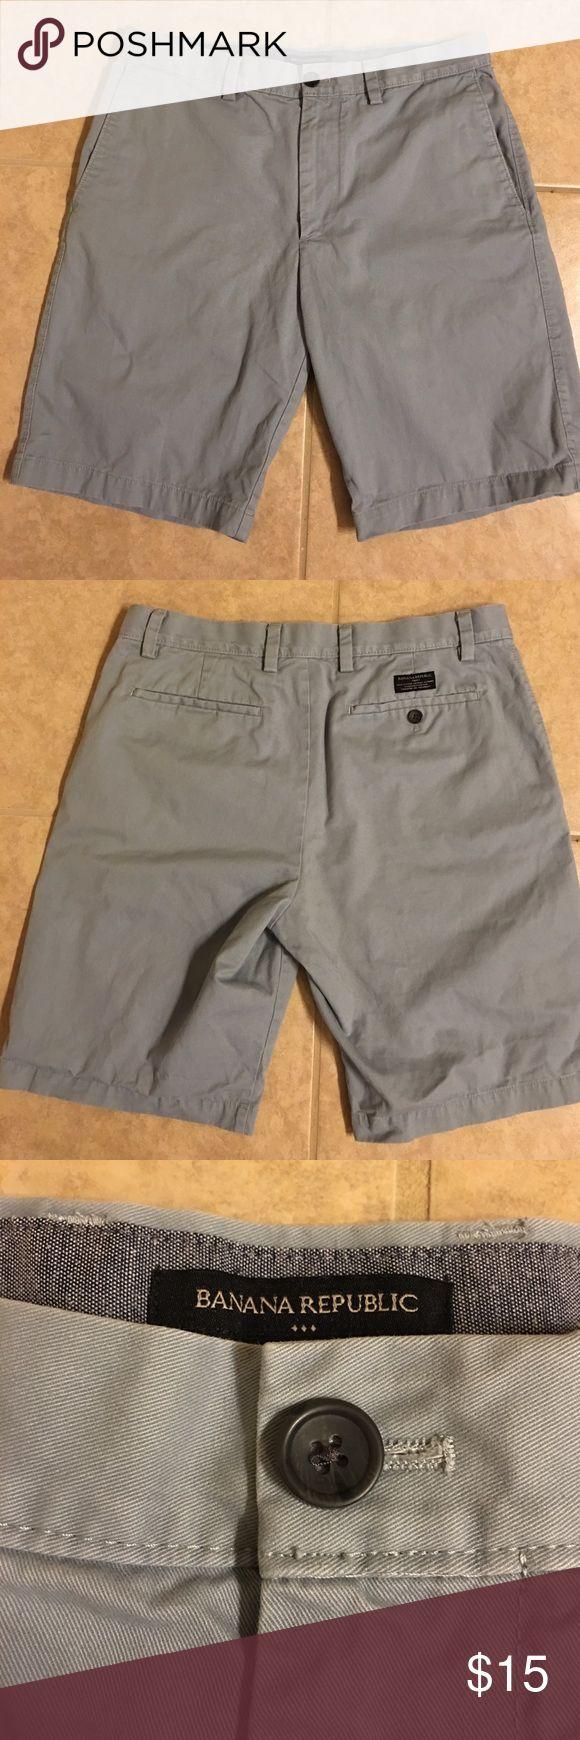 "☀️Men's Banana Republic Chinos Shorts W33"" Men's Banana Republic Chinos Shorts.  Waist 33"".    Light blue.  Great condition!  Smoke-free home, bundle and save! Summer is coming!  ☀️ Banana Republic Shorts Flat Front"